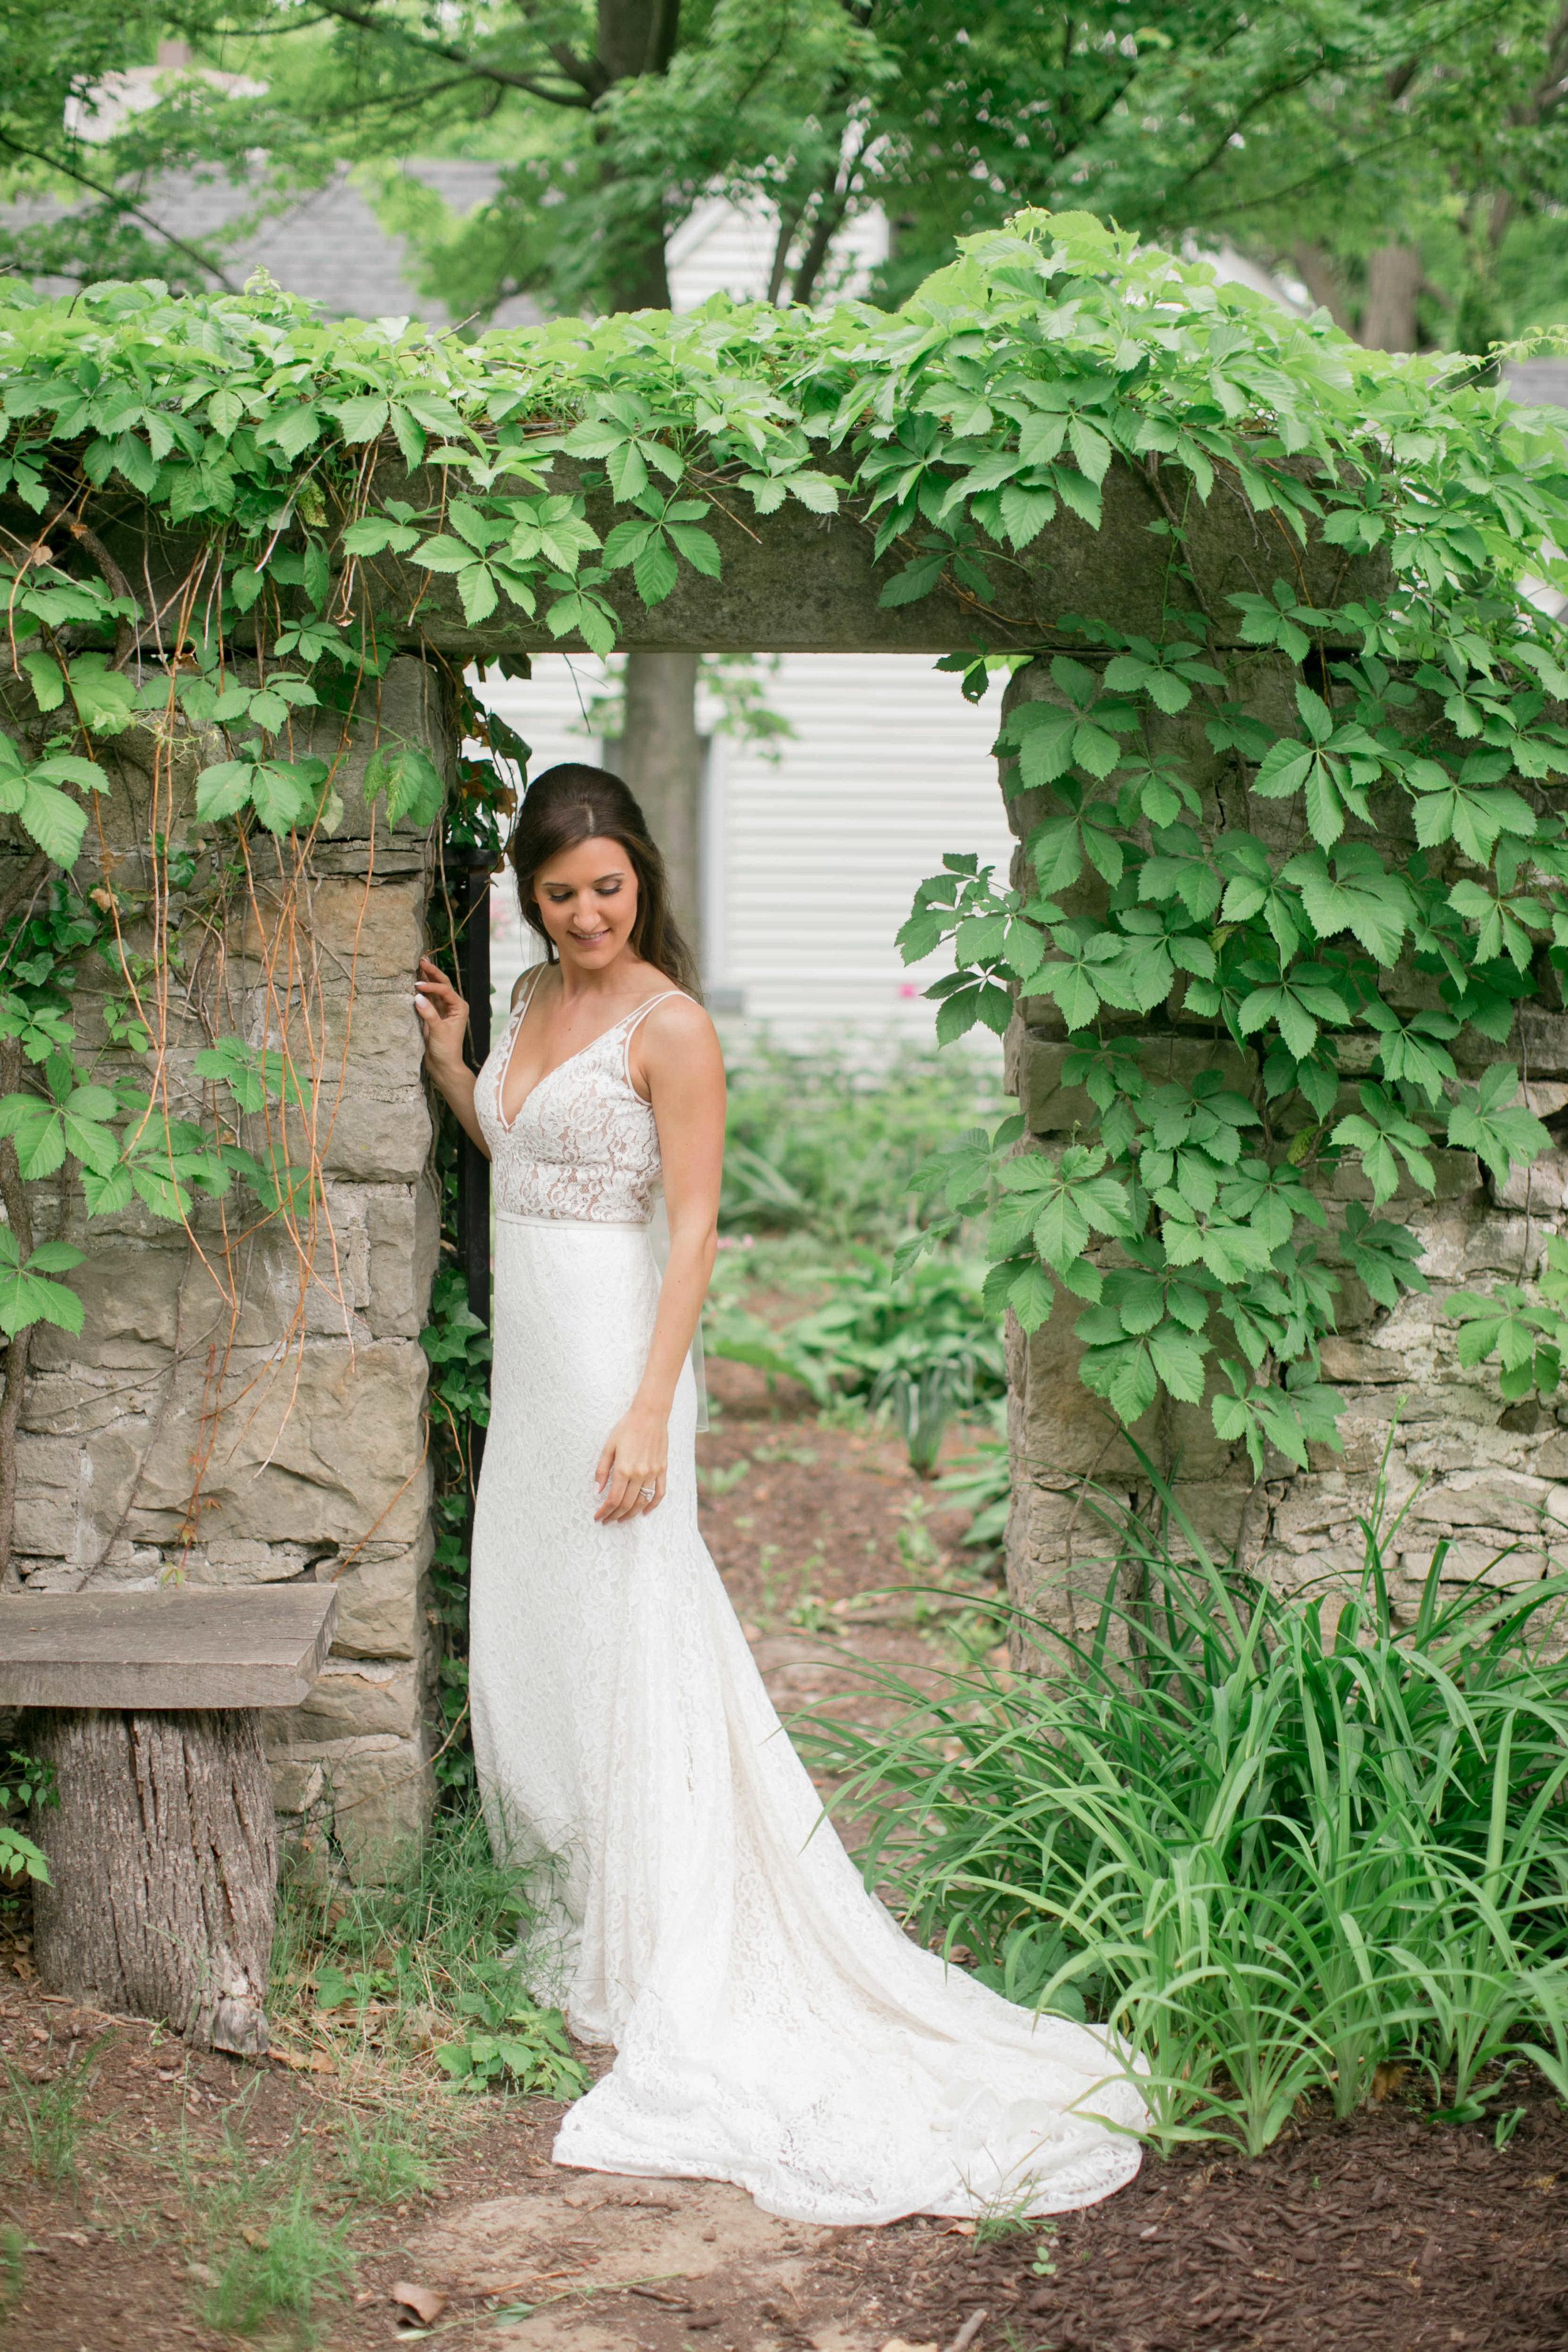 Miranda___Daniel___Daniel_Ricci_Weddings___High_Res._Finals_424.jpg